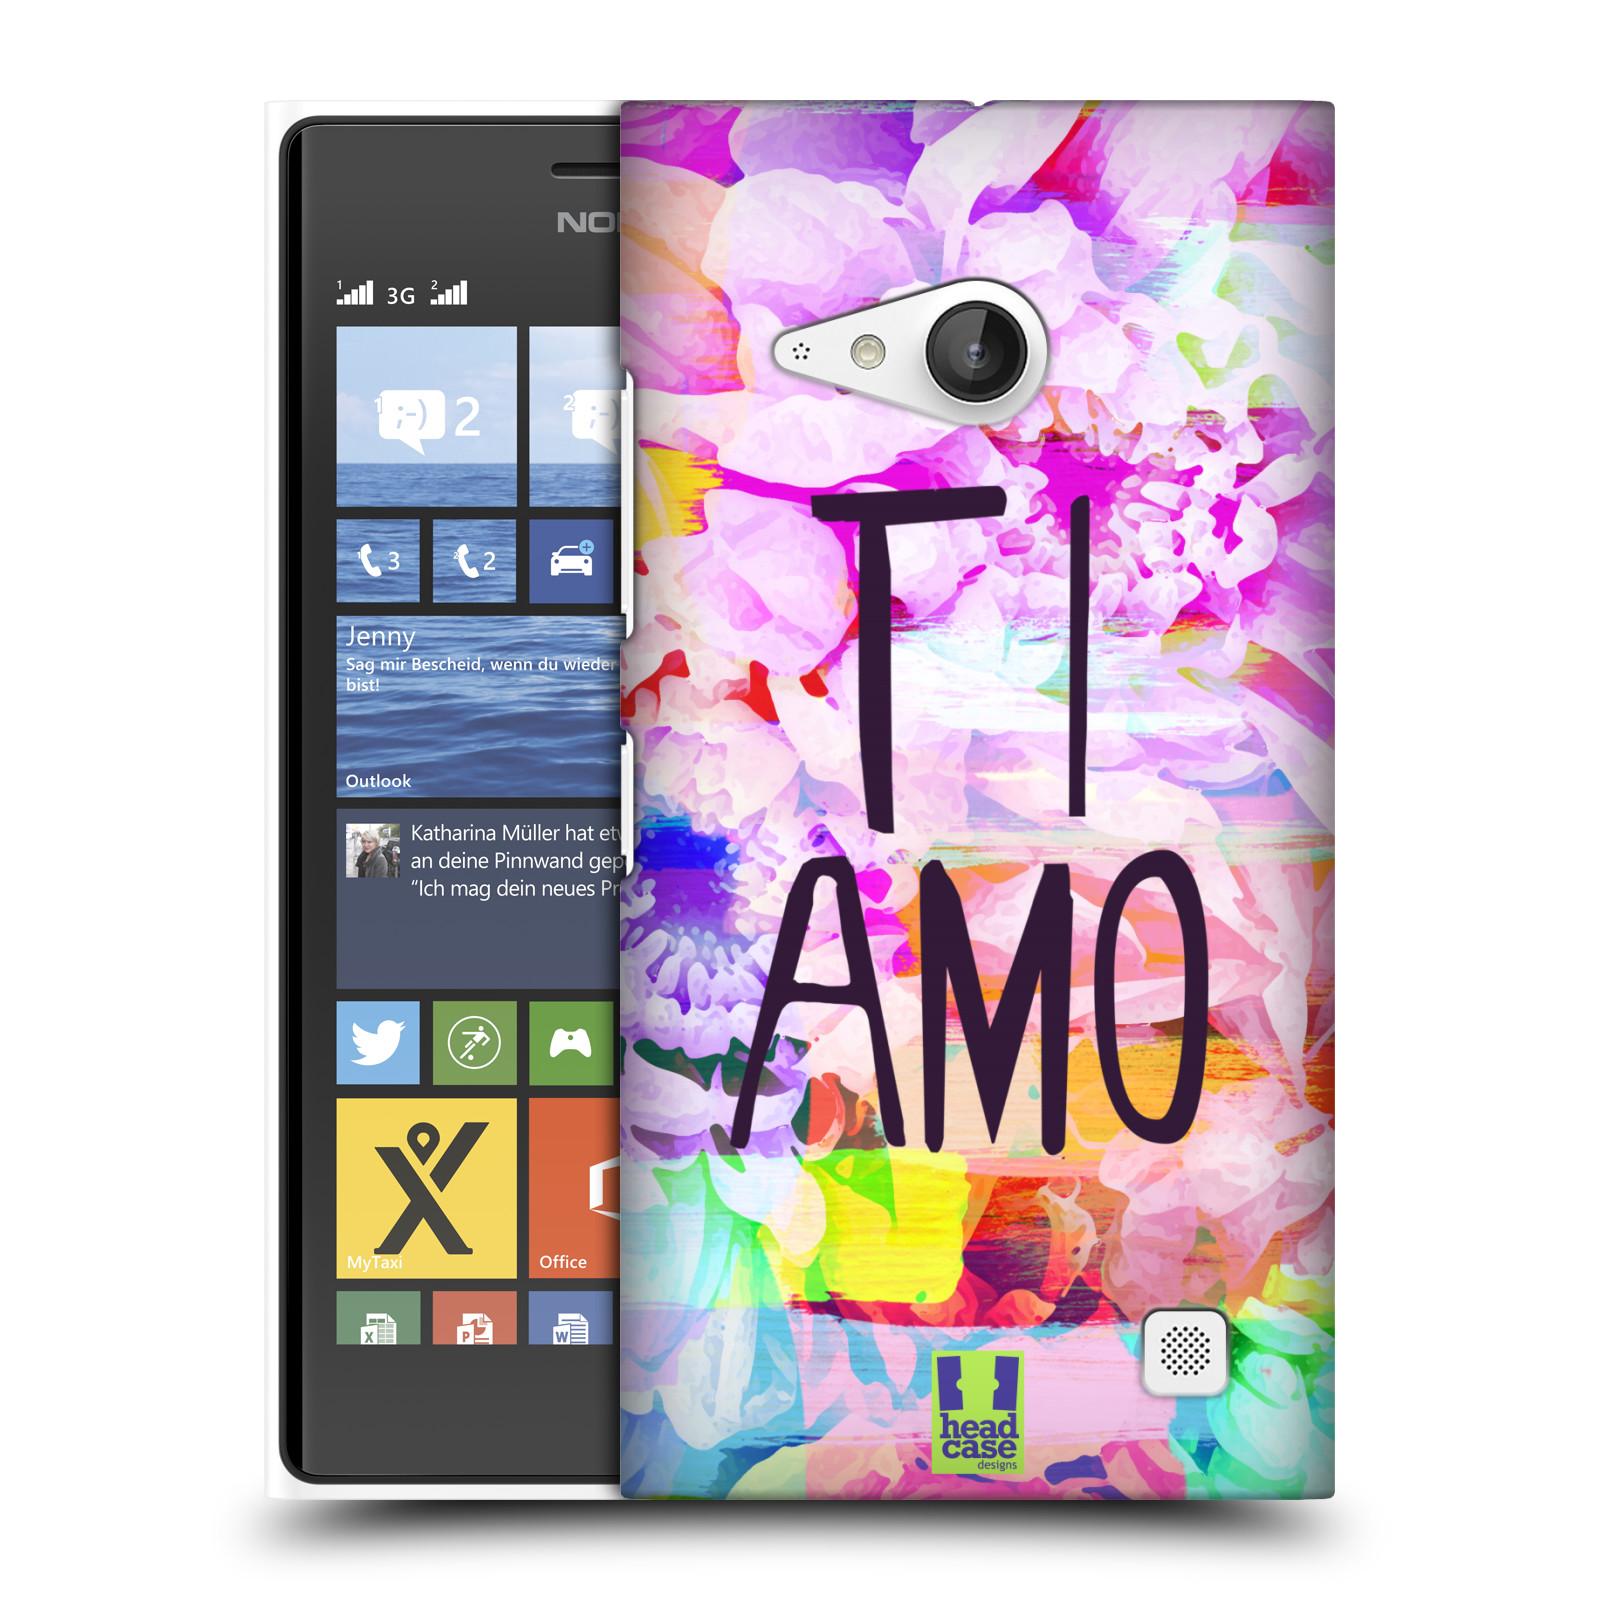 Plastové pouzdro na mobil Nokia Lumia 730 Dual SIM HEAD CASE Květy Ti Amo (Plastový kryt či obal na mobilní telefon Nokia Lumia 730 Dual SIM)